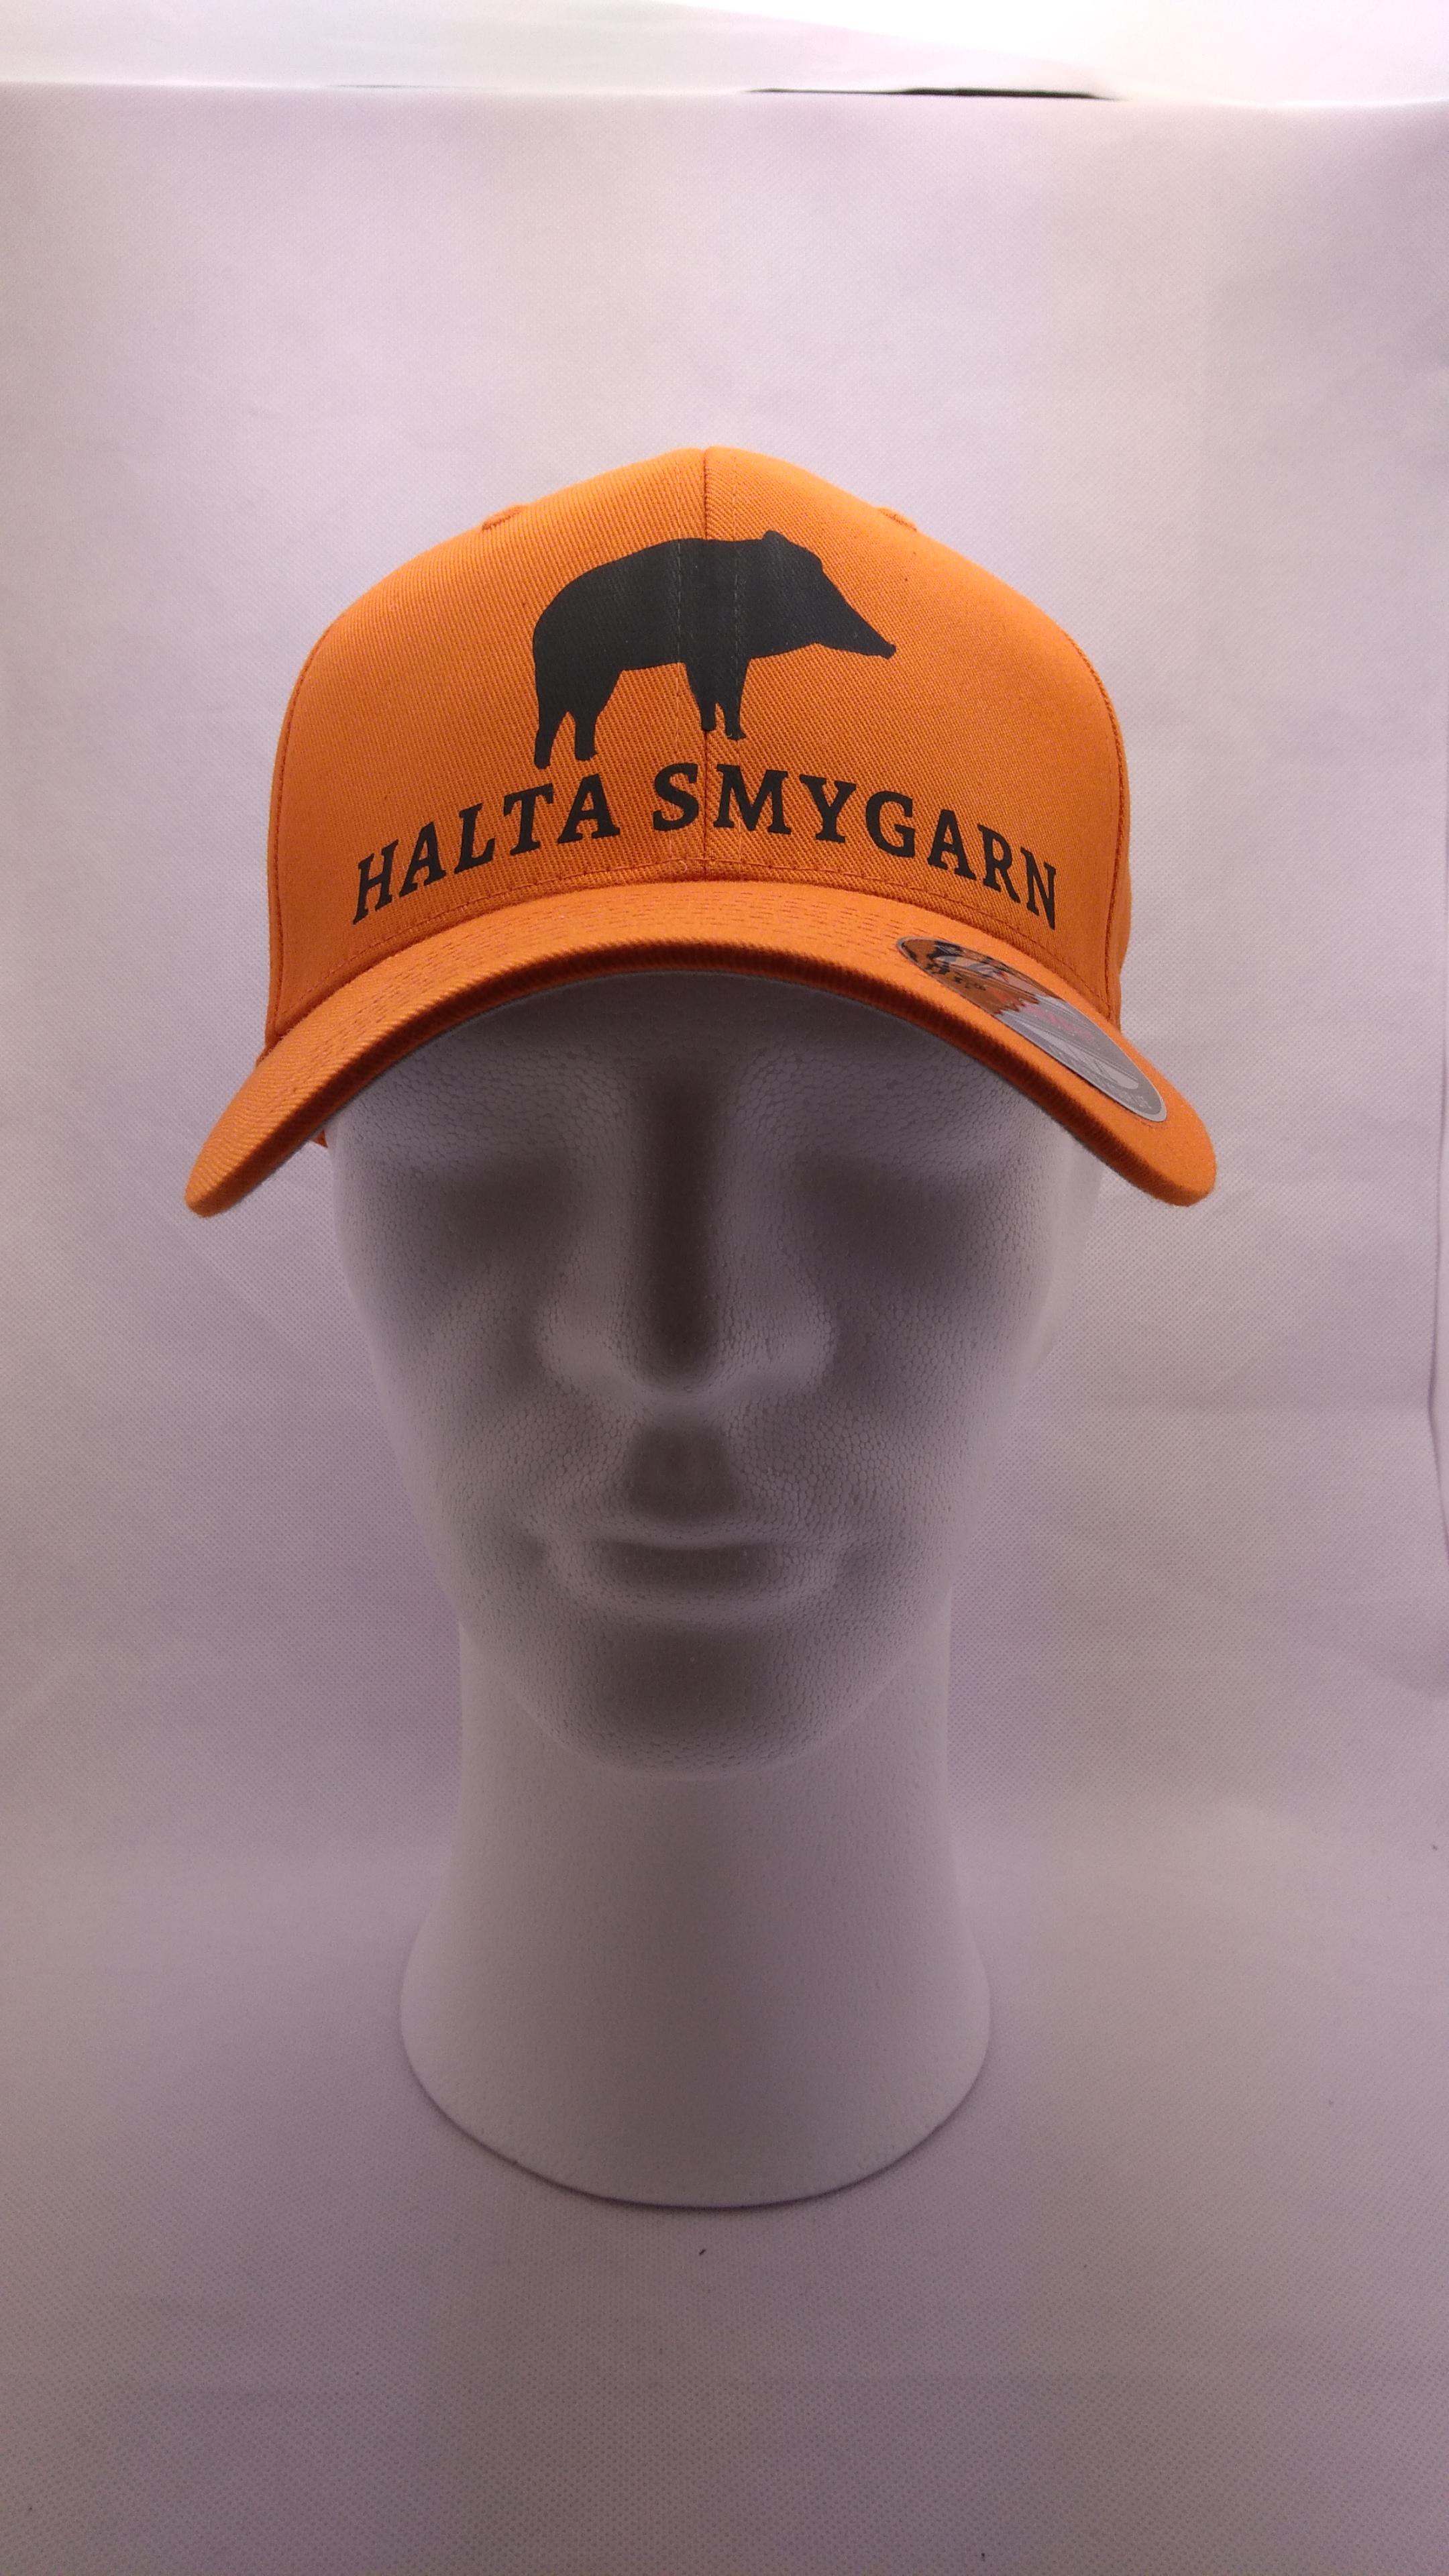 Halta smygarn